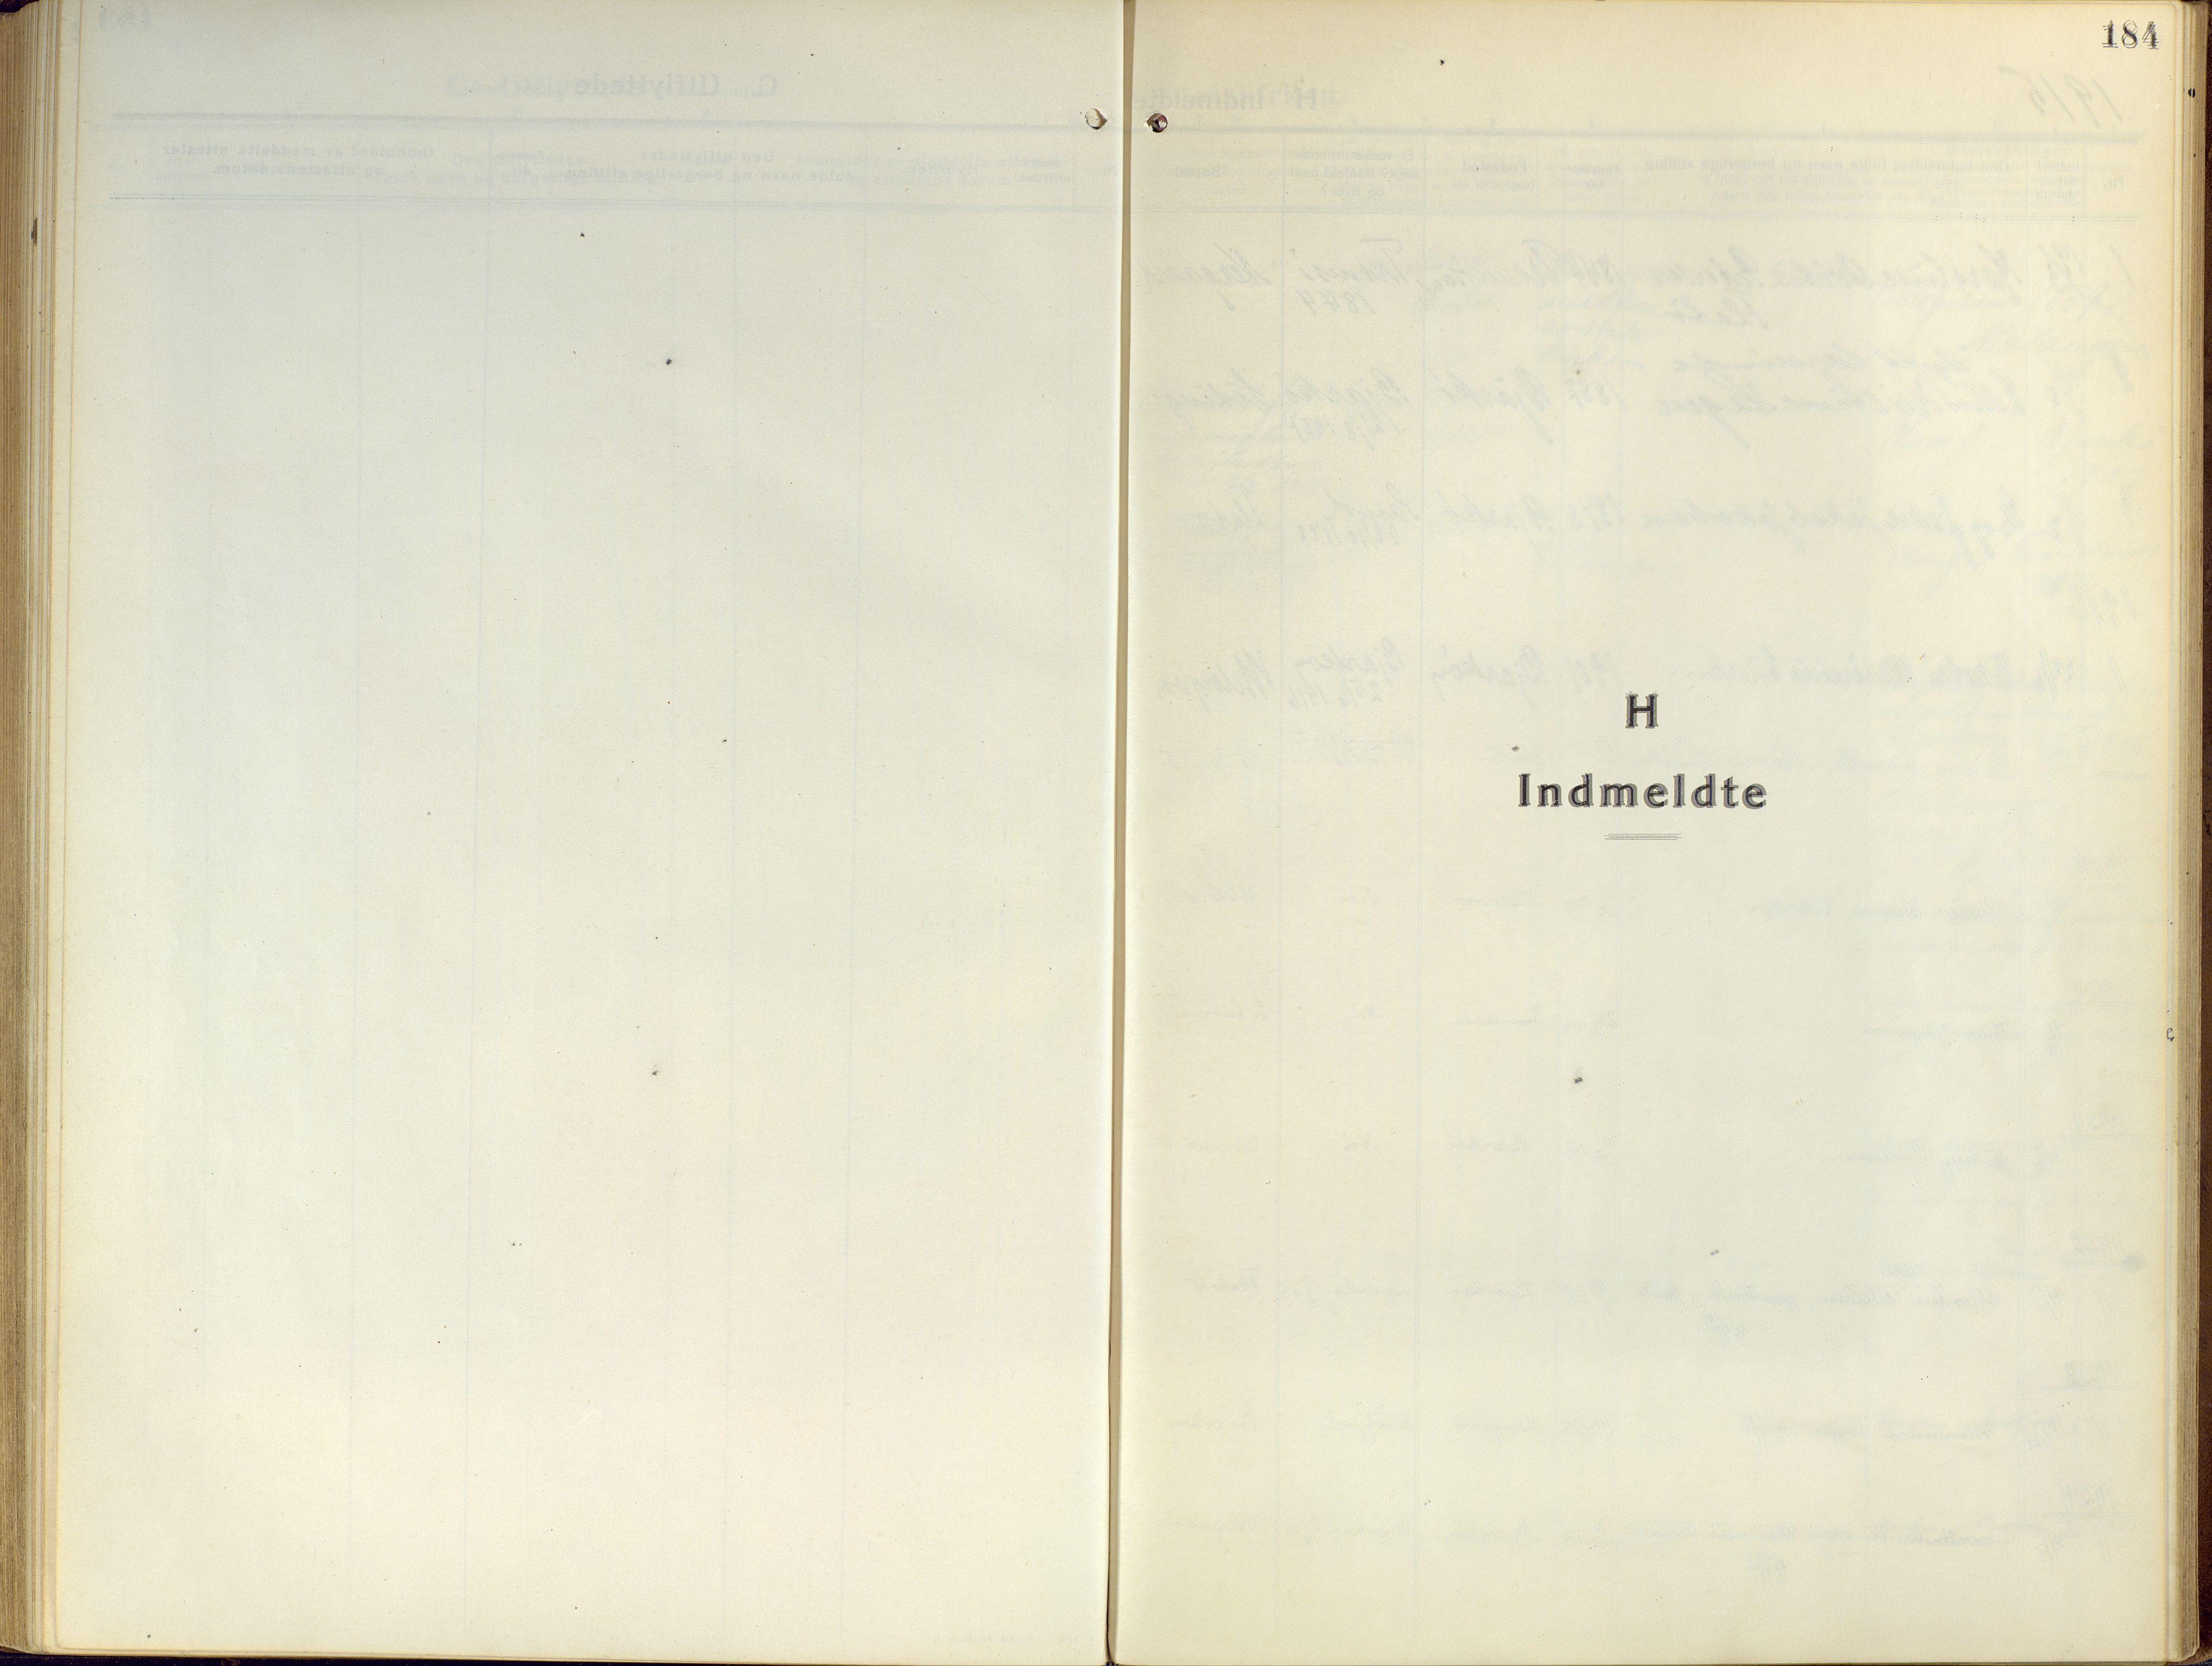 SATØ, Sand/Bjarkøy sokneprestkontor, I/Ia/Iaa/L0006kirke: Ministerialbok nr. 6, 1915-1929, s. 181